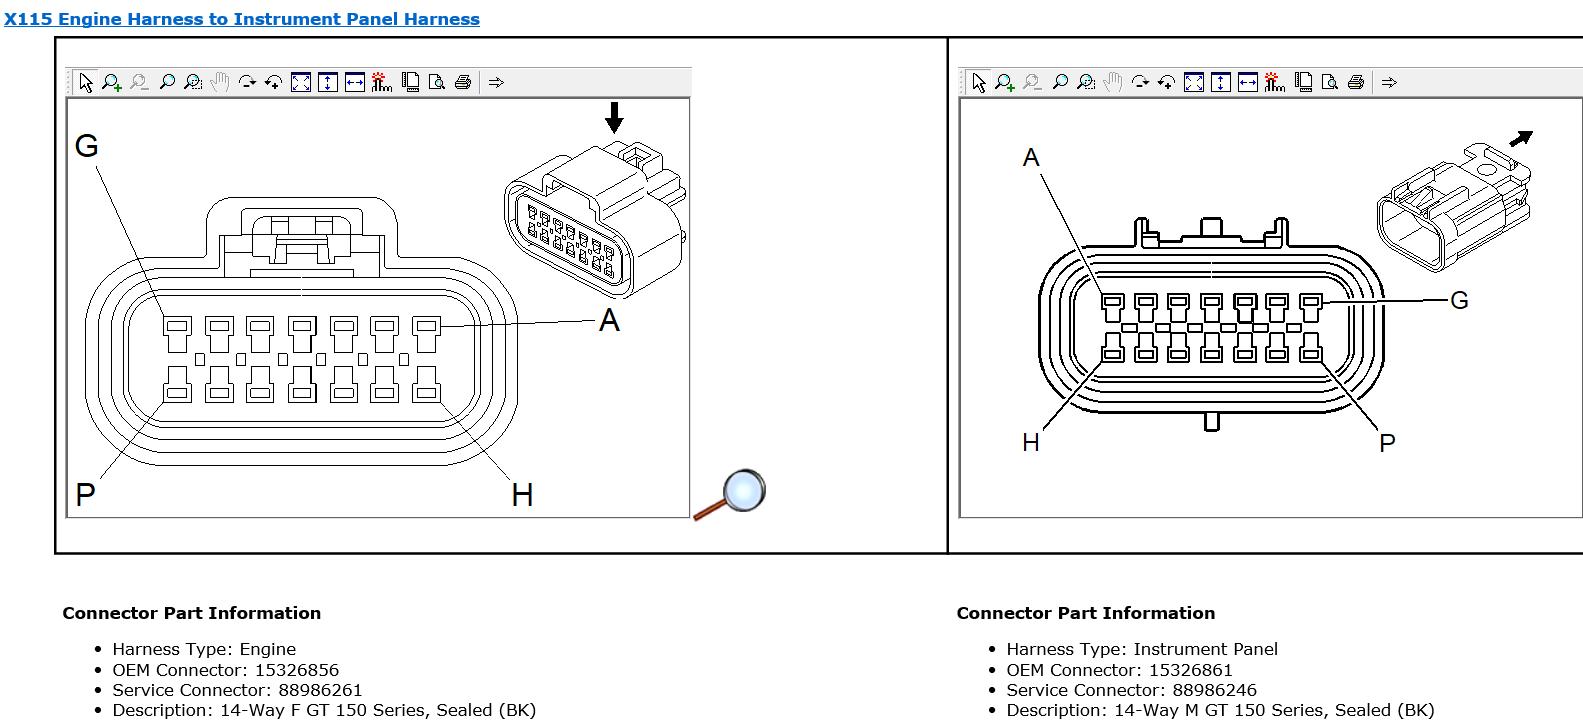 Lfx Engine Wiring Harness Schematic Diagram Impala 3 6 Swap Chevy Forums Ford Explorer